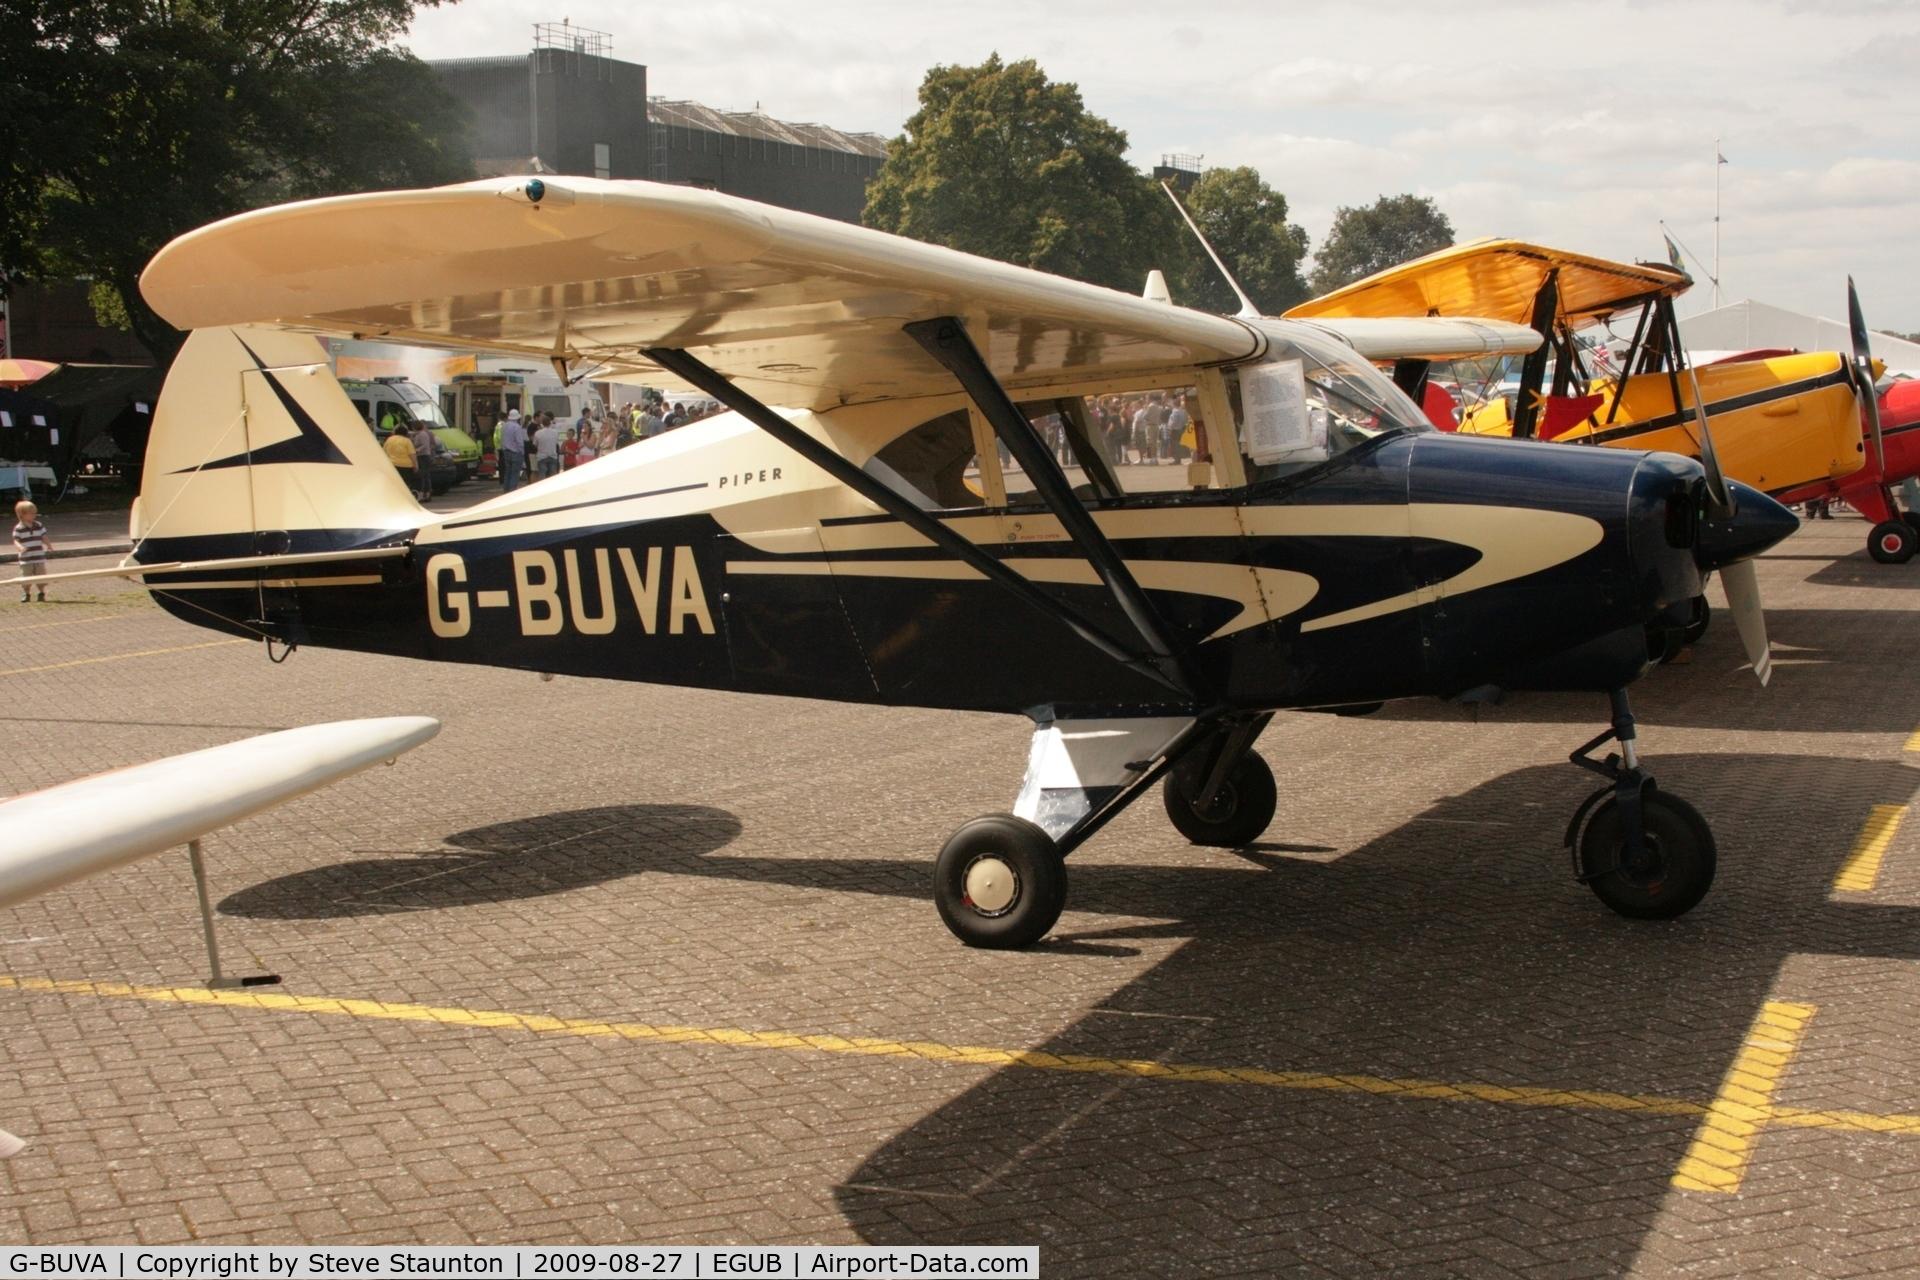 G-BUVA, 1959 Piper PA-22-135 Tri-Pacer C/N 22-1301, Taken at RAF Benson Families Day, August 2009